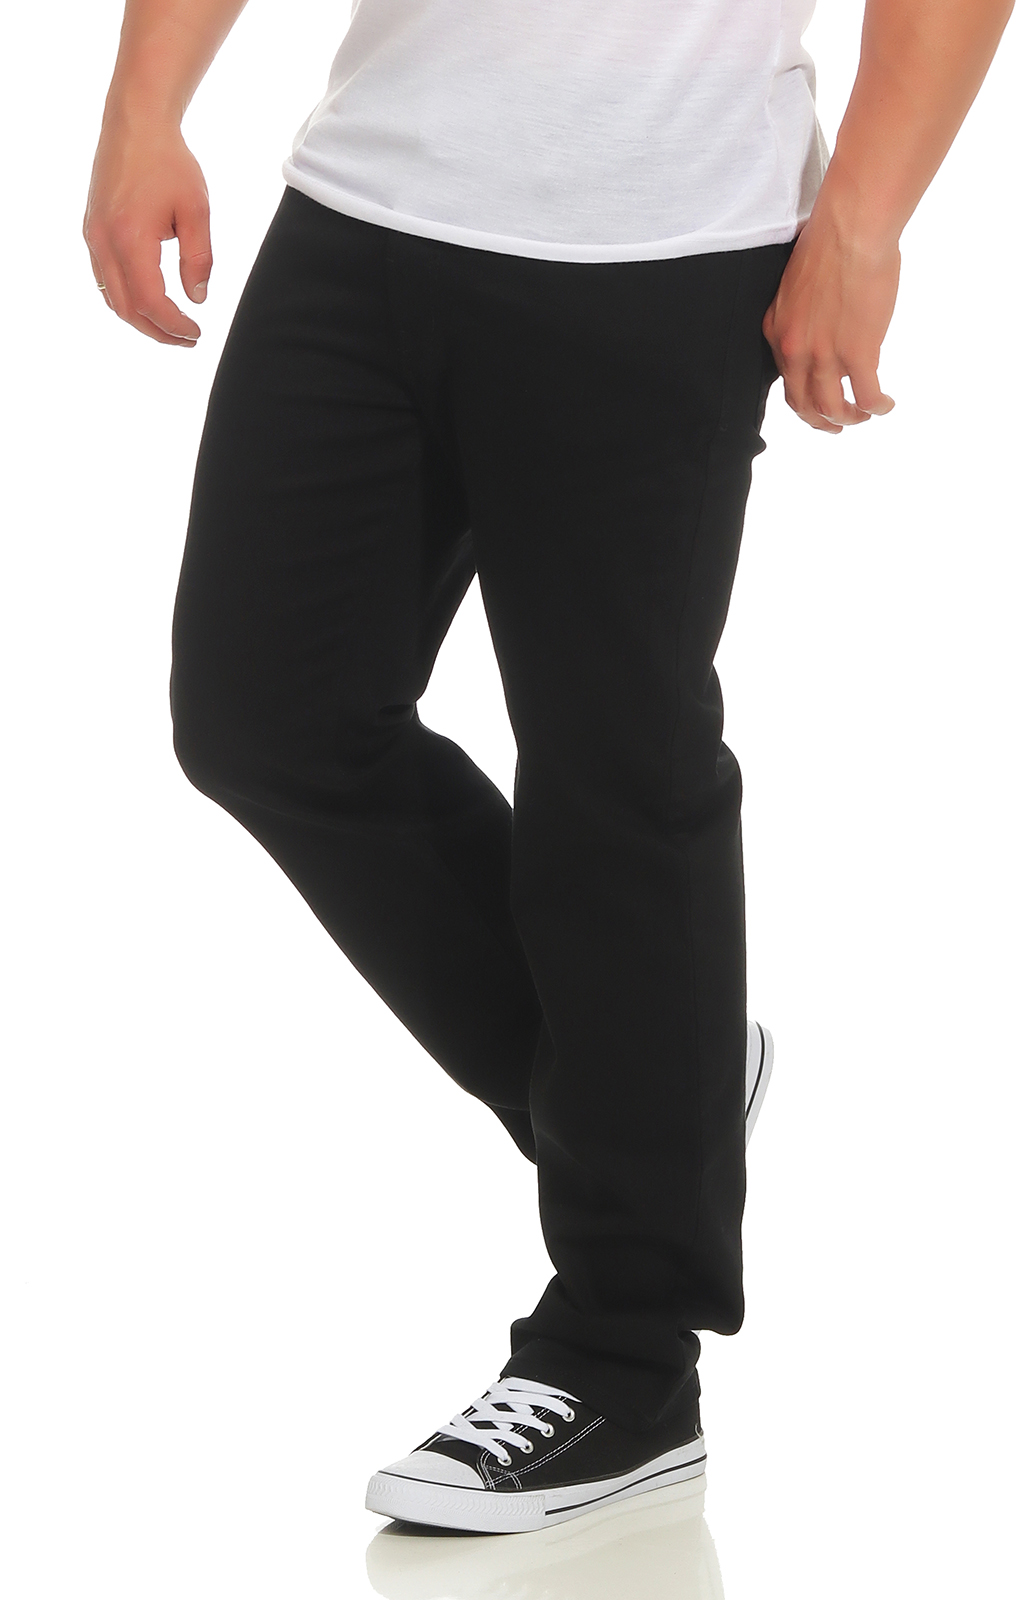 PIERRE-CARDIN-Herren-Jeans-Dijon-Hose-Comfort-Stretch-Freizeitjeans-Modern-NEU-3 Indexbild 11